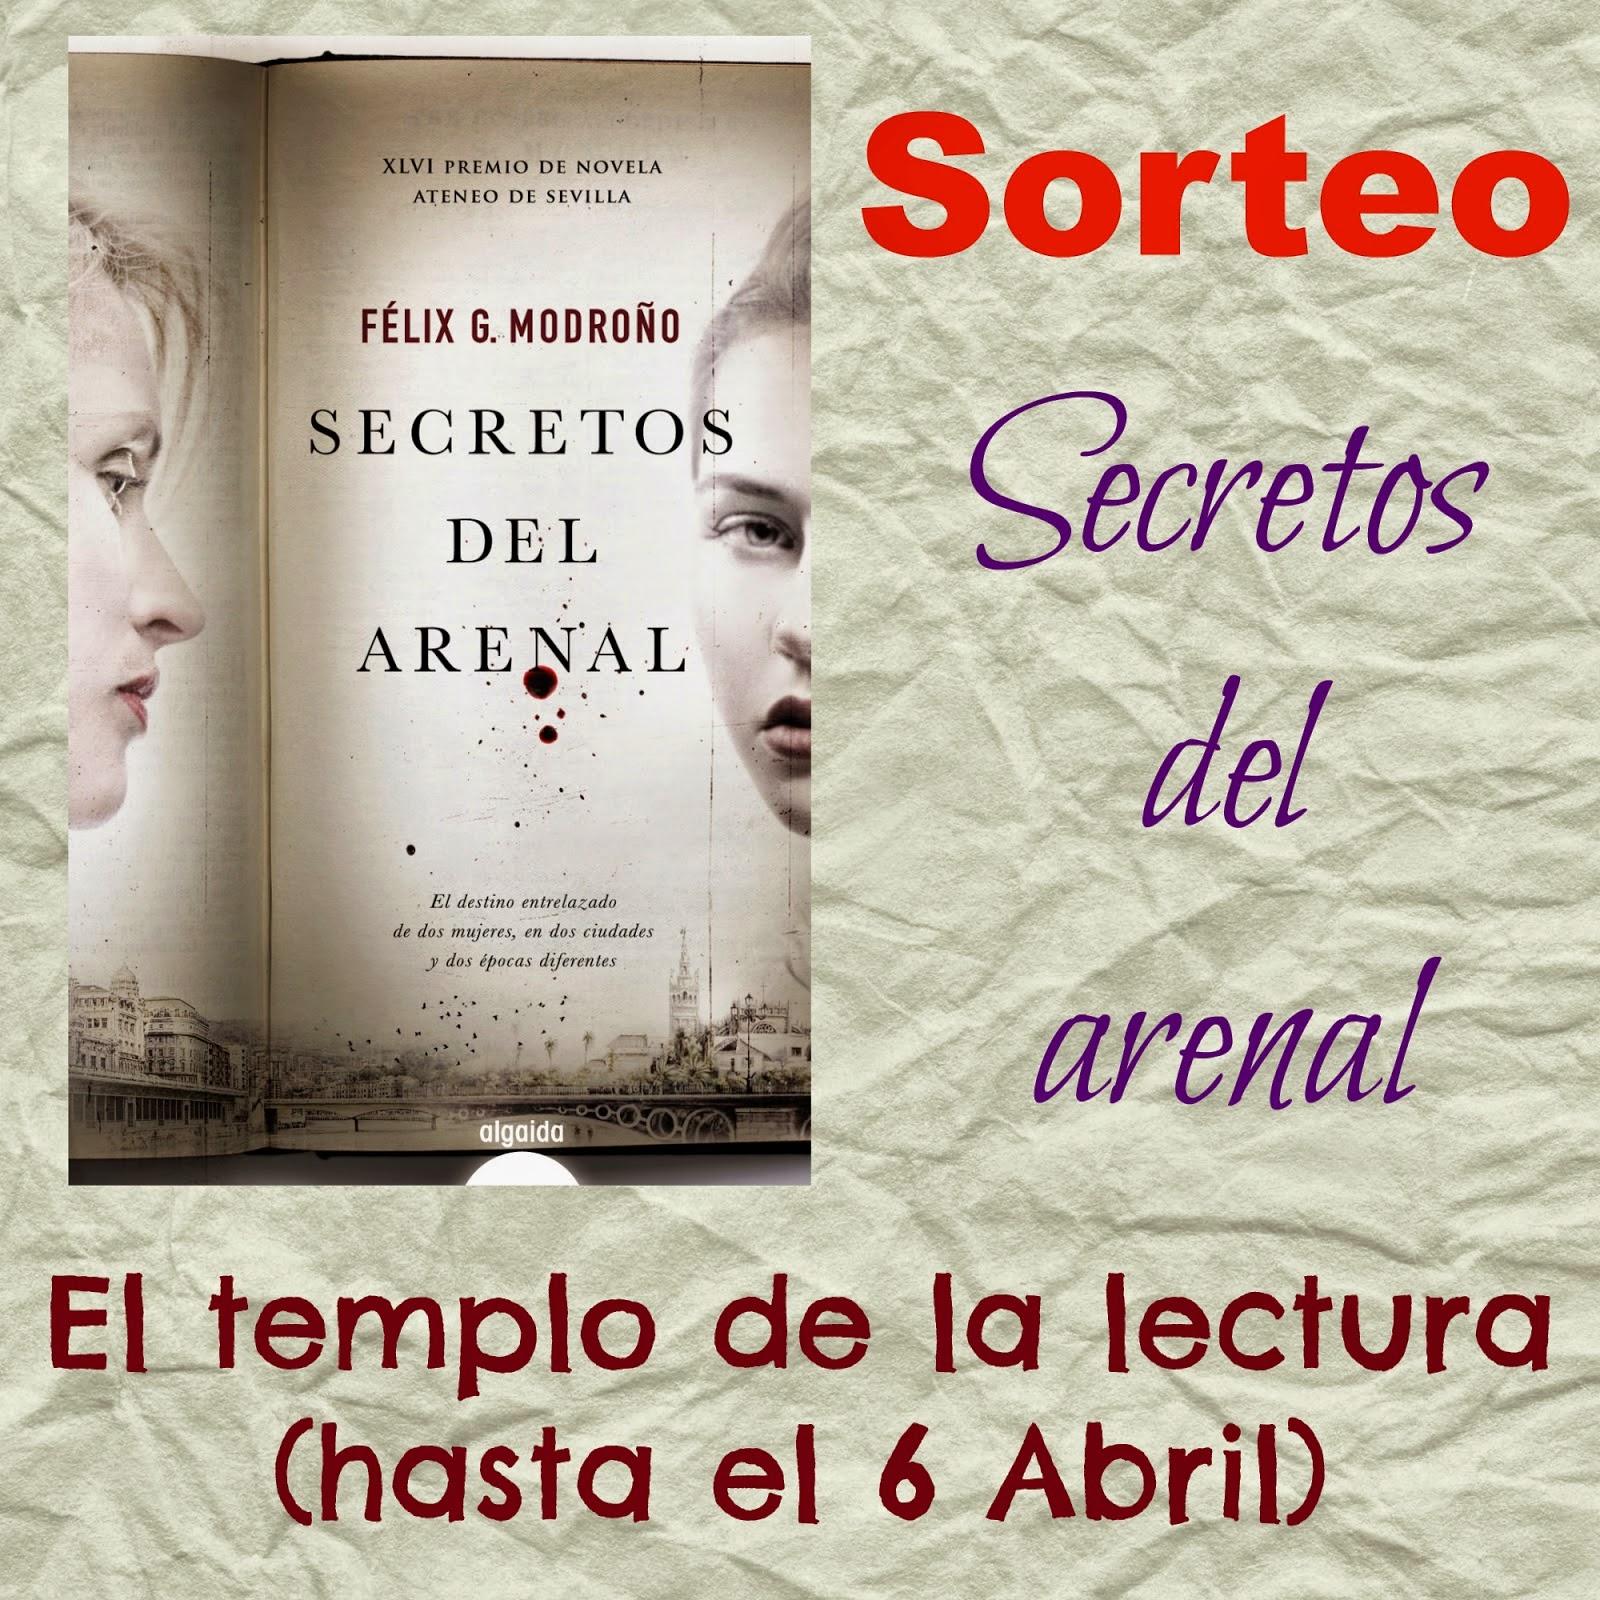 http://eltemplodelalectura.blogspot.com.es/2015/03/sorteo-secretos-del-arenal.html?showComment=1426287003318#c424772191903526615